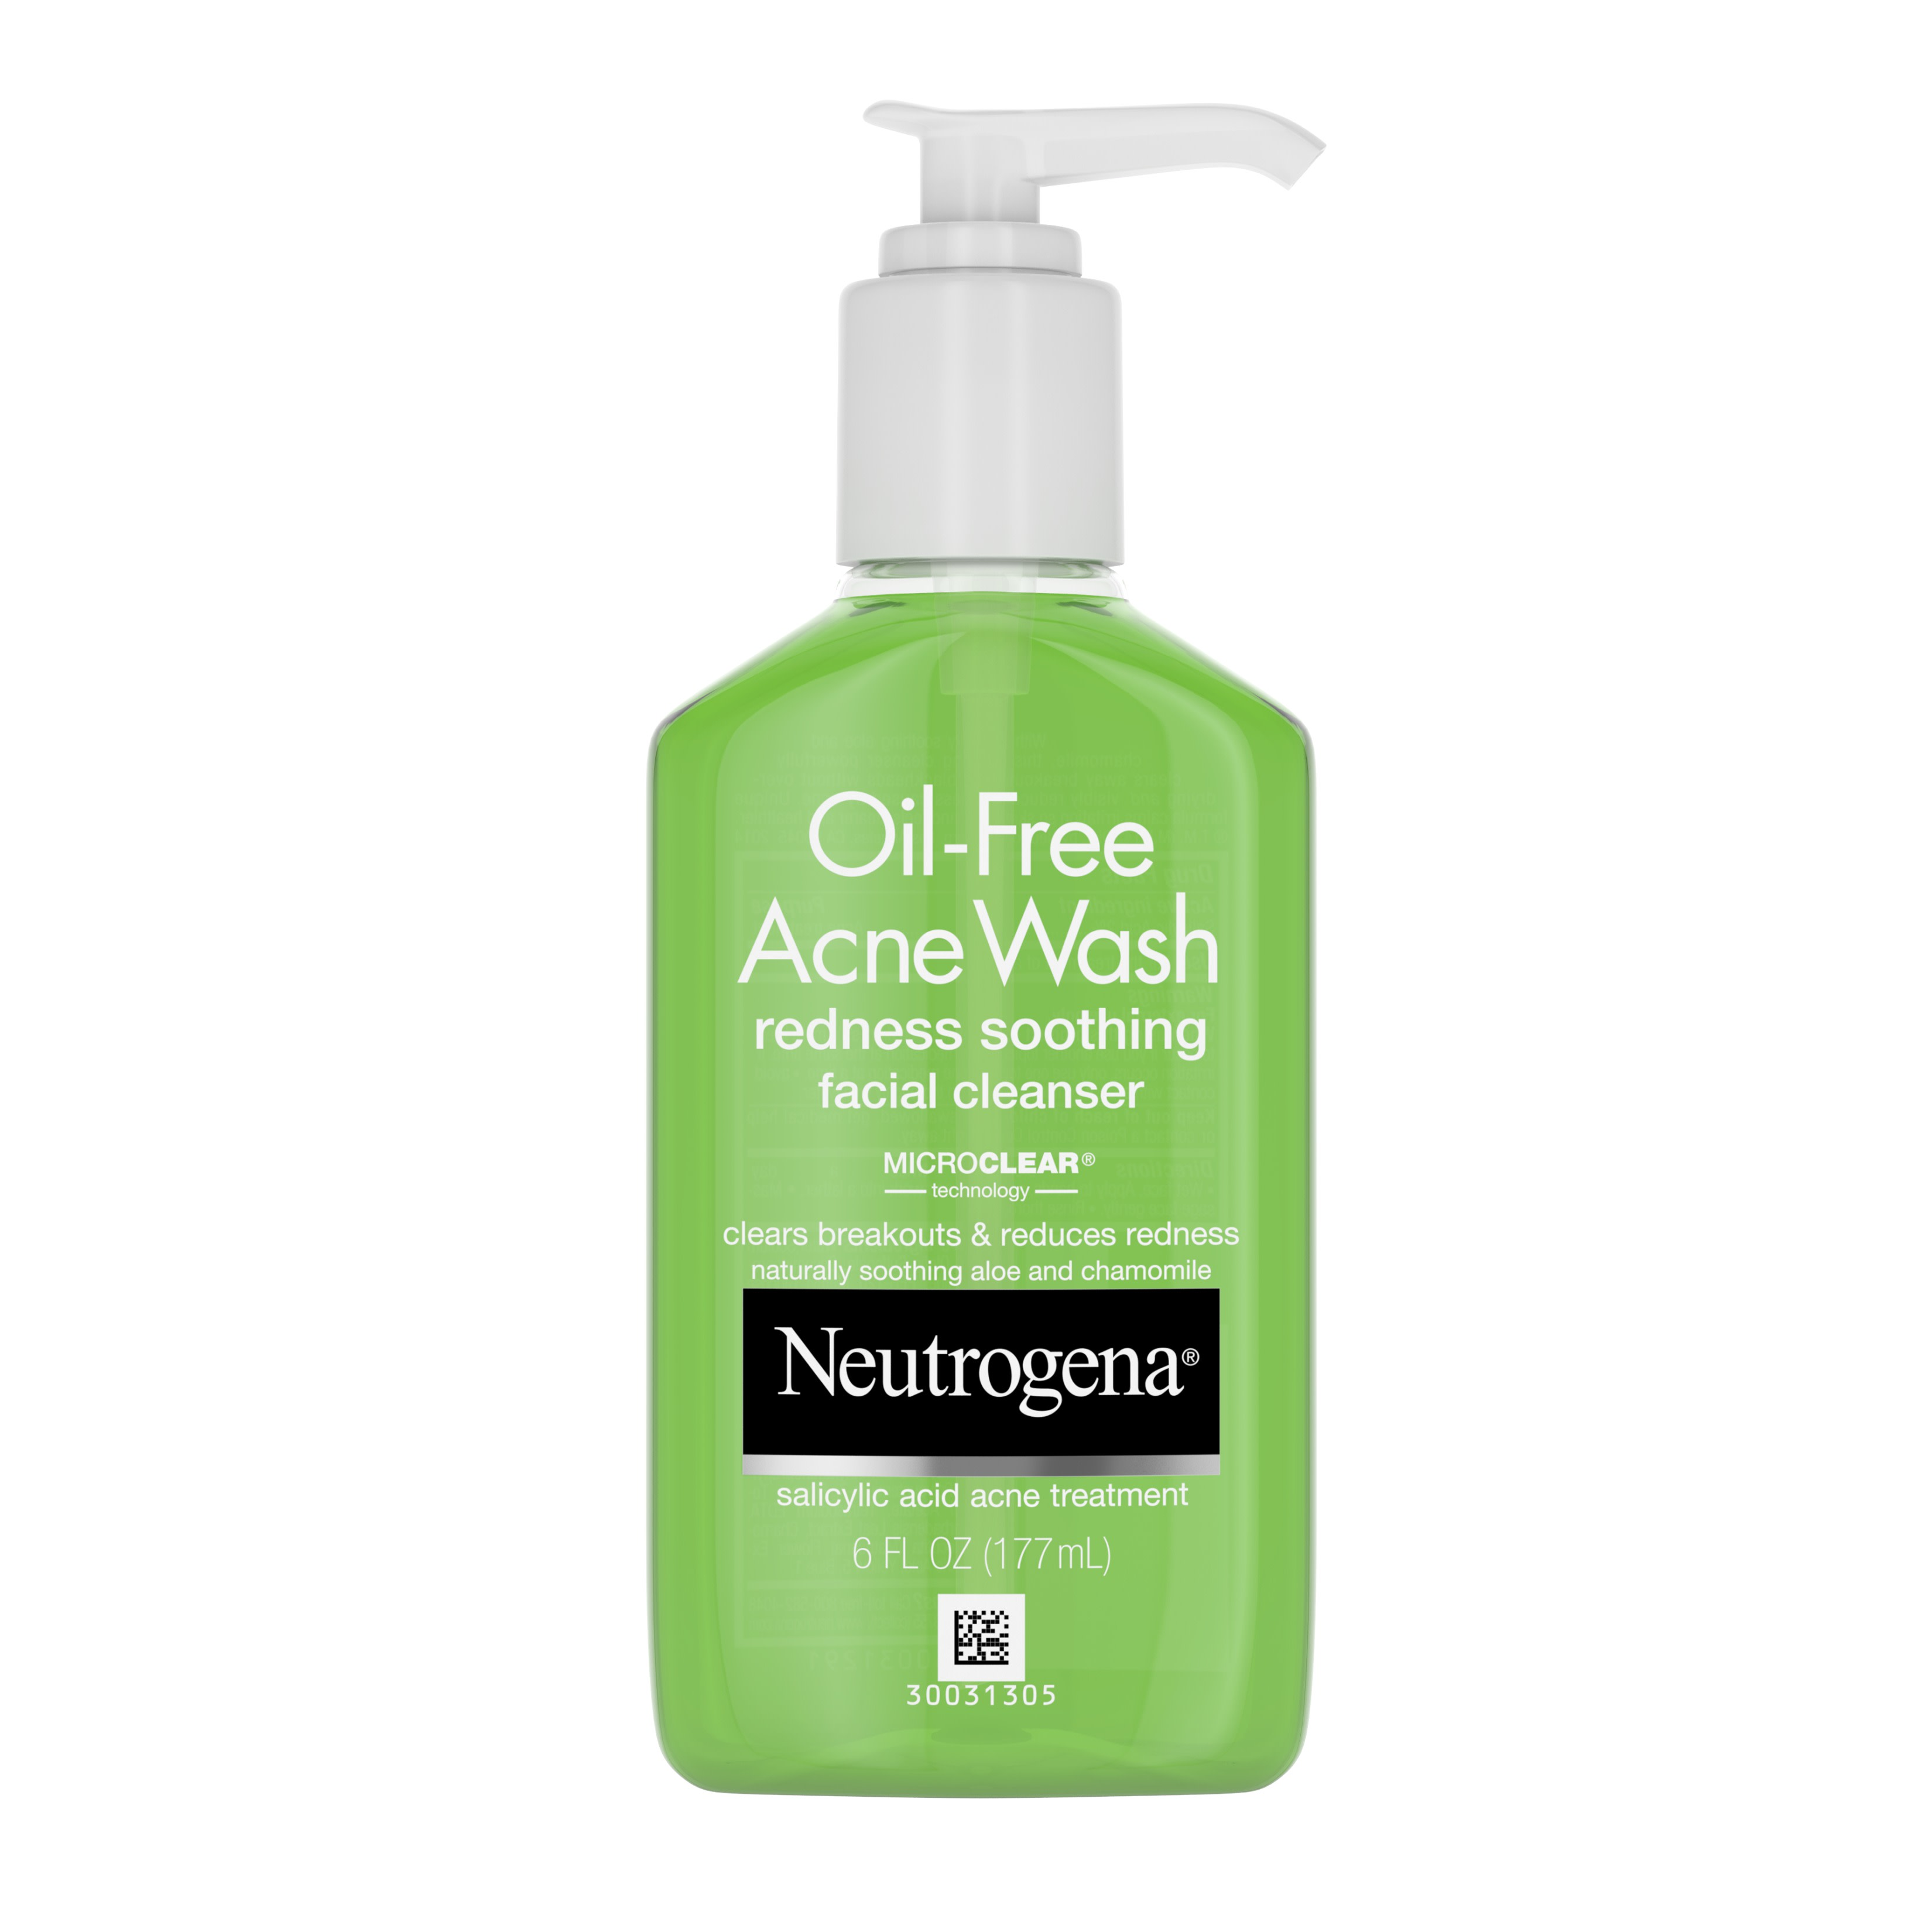 Neutrogena Oil Free Acne Wash Salicylic Acid Facial Cleaner For Oily Skin Oil Free 6 Fl Oz Walmart Com Walmart Com